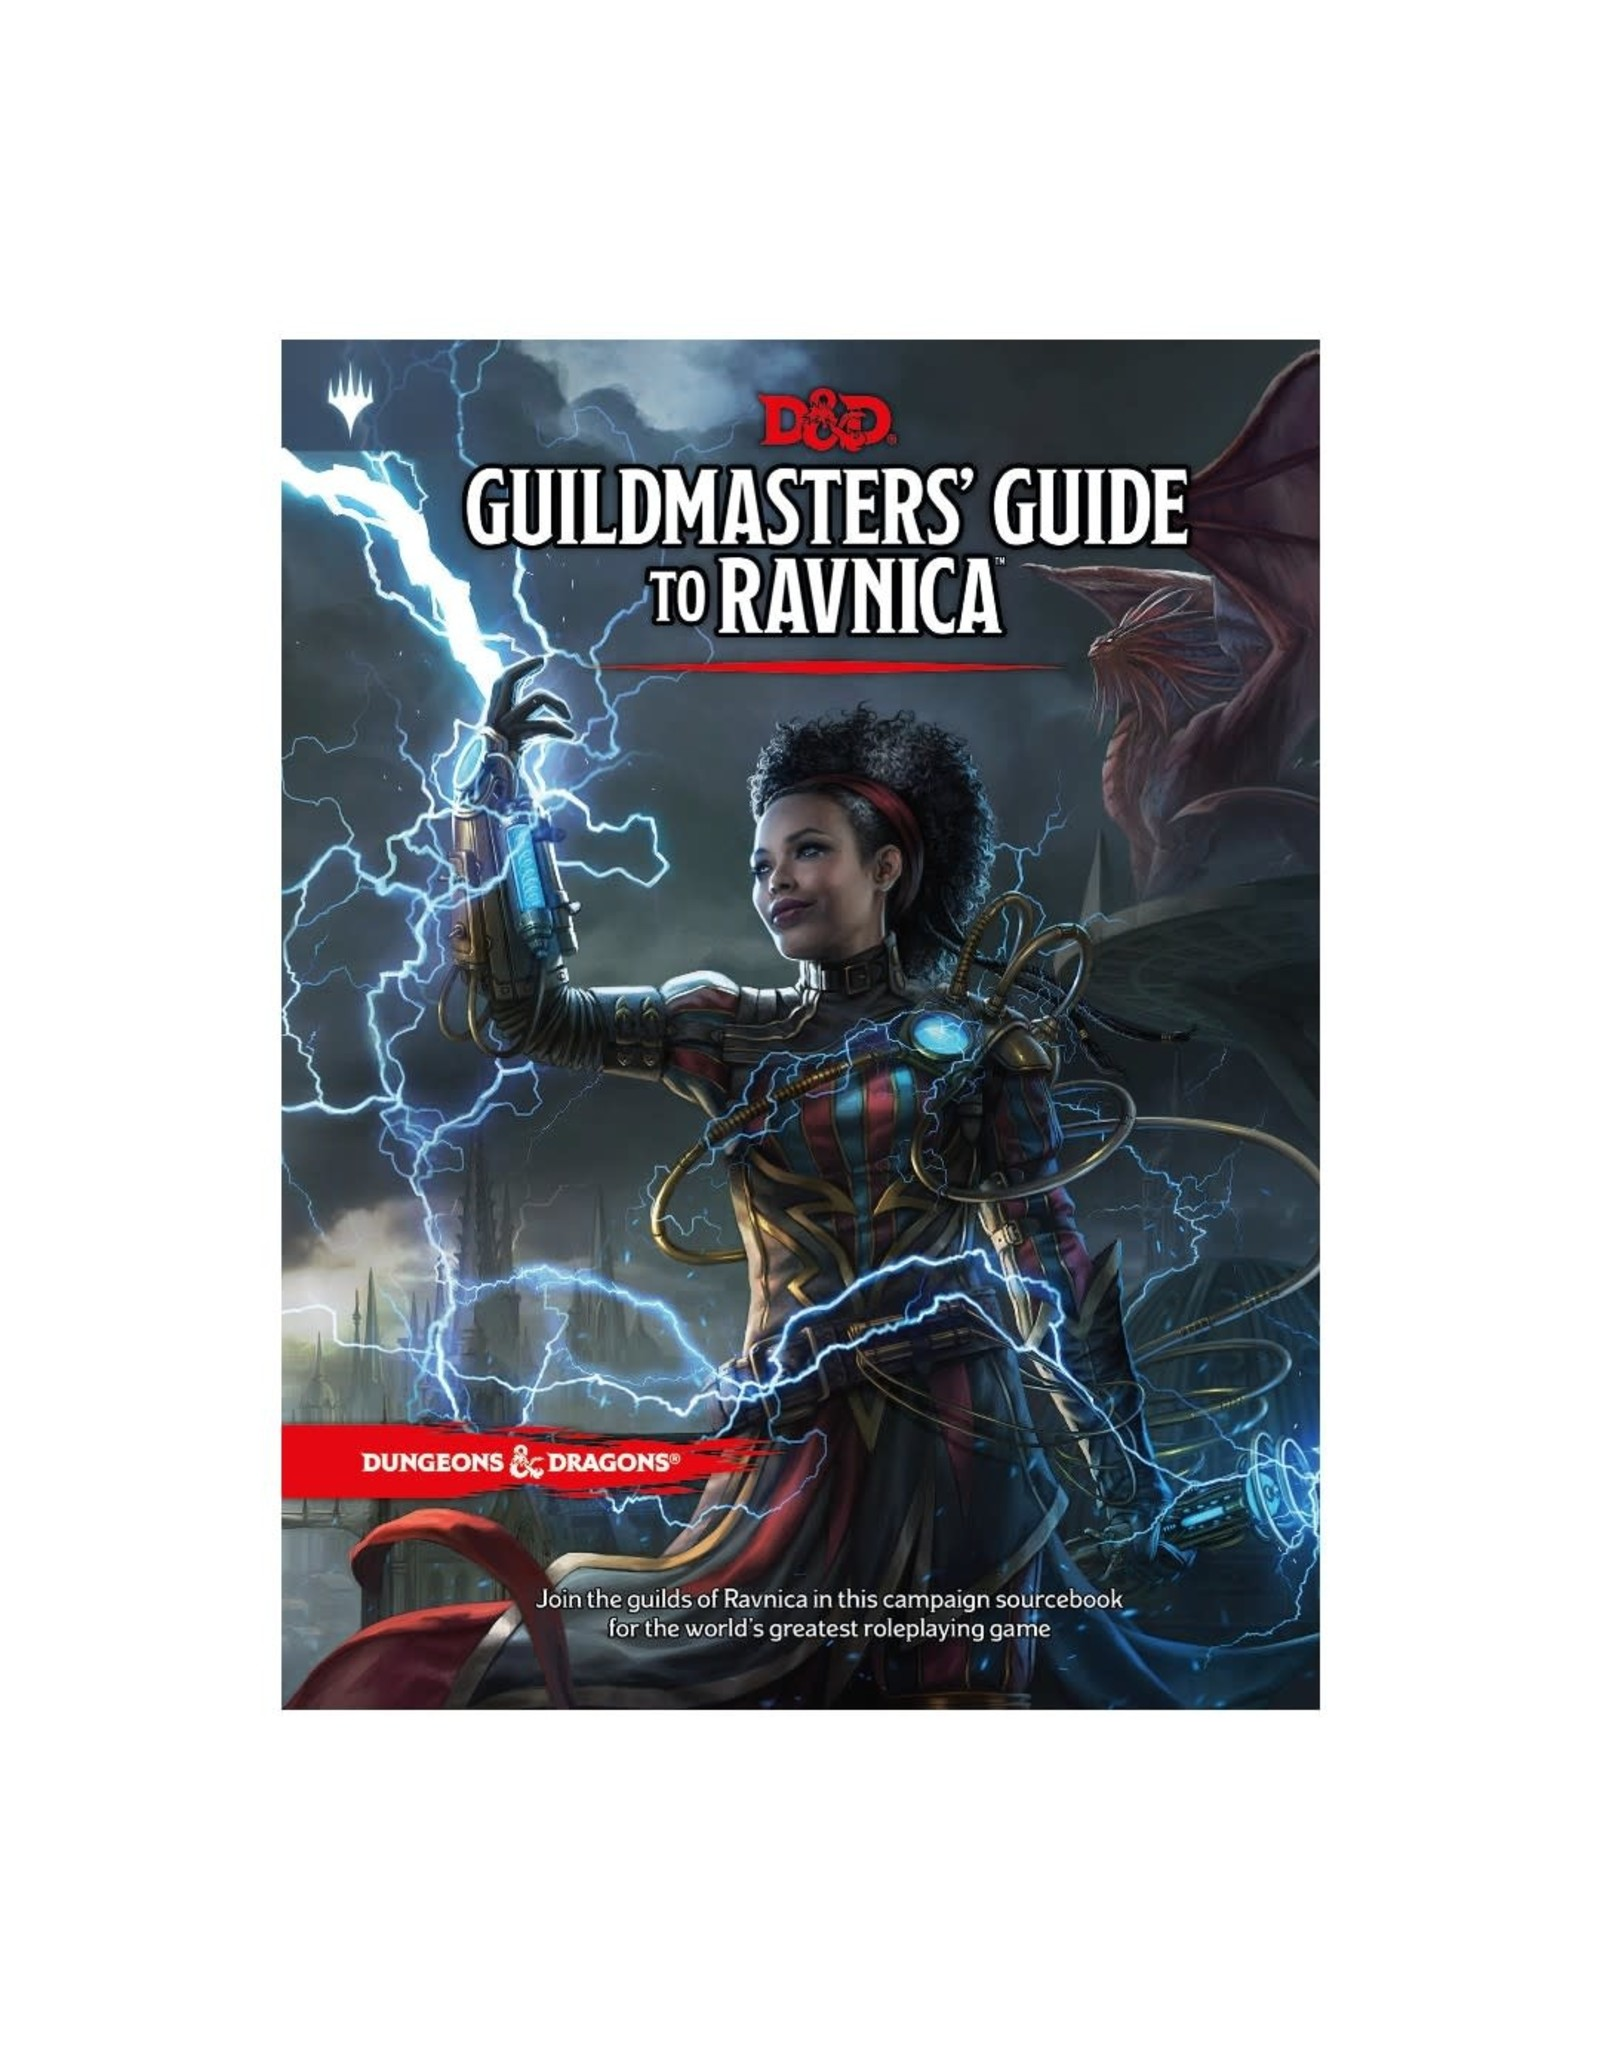 Dungeons & Dragons D&D Guildmasters Guide: Ravnica